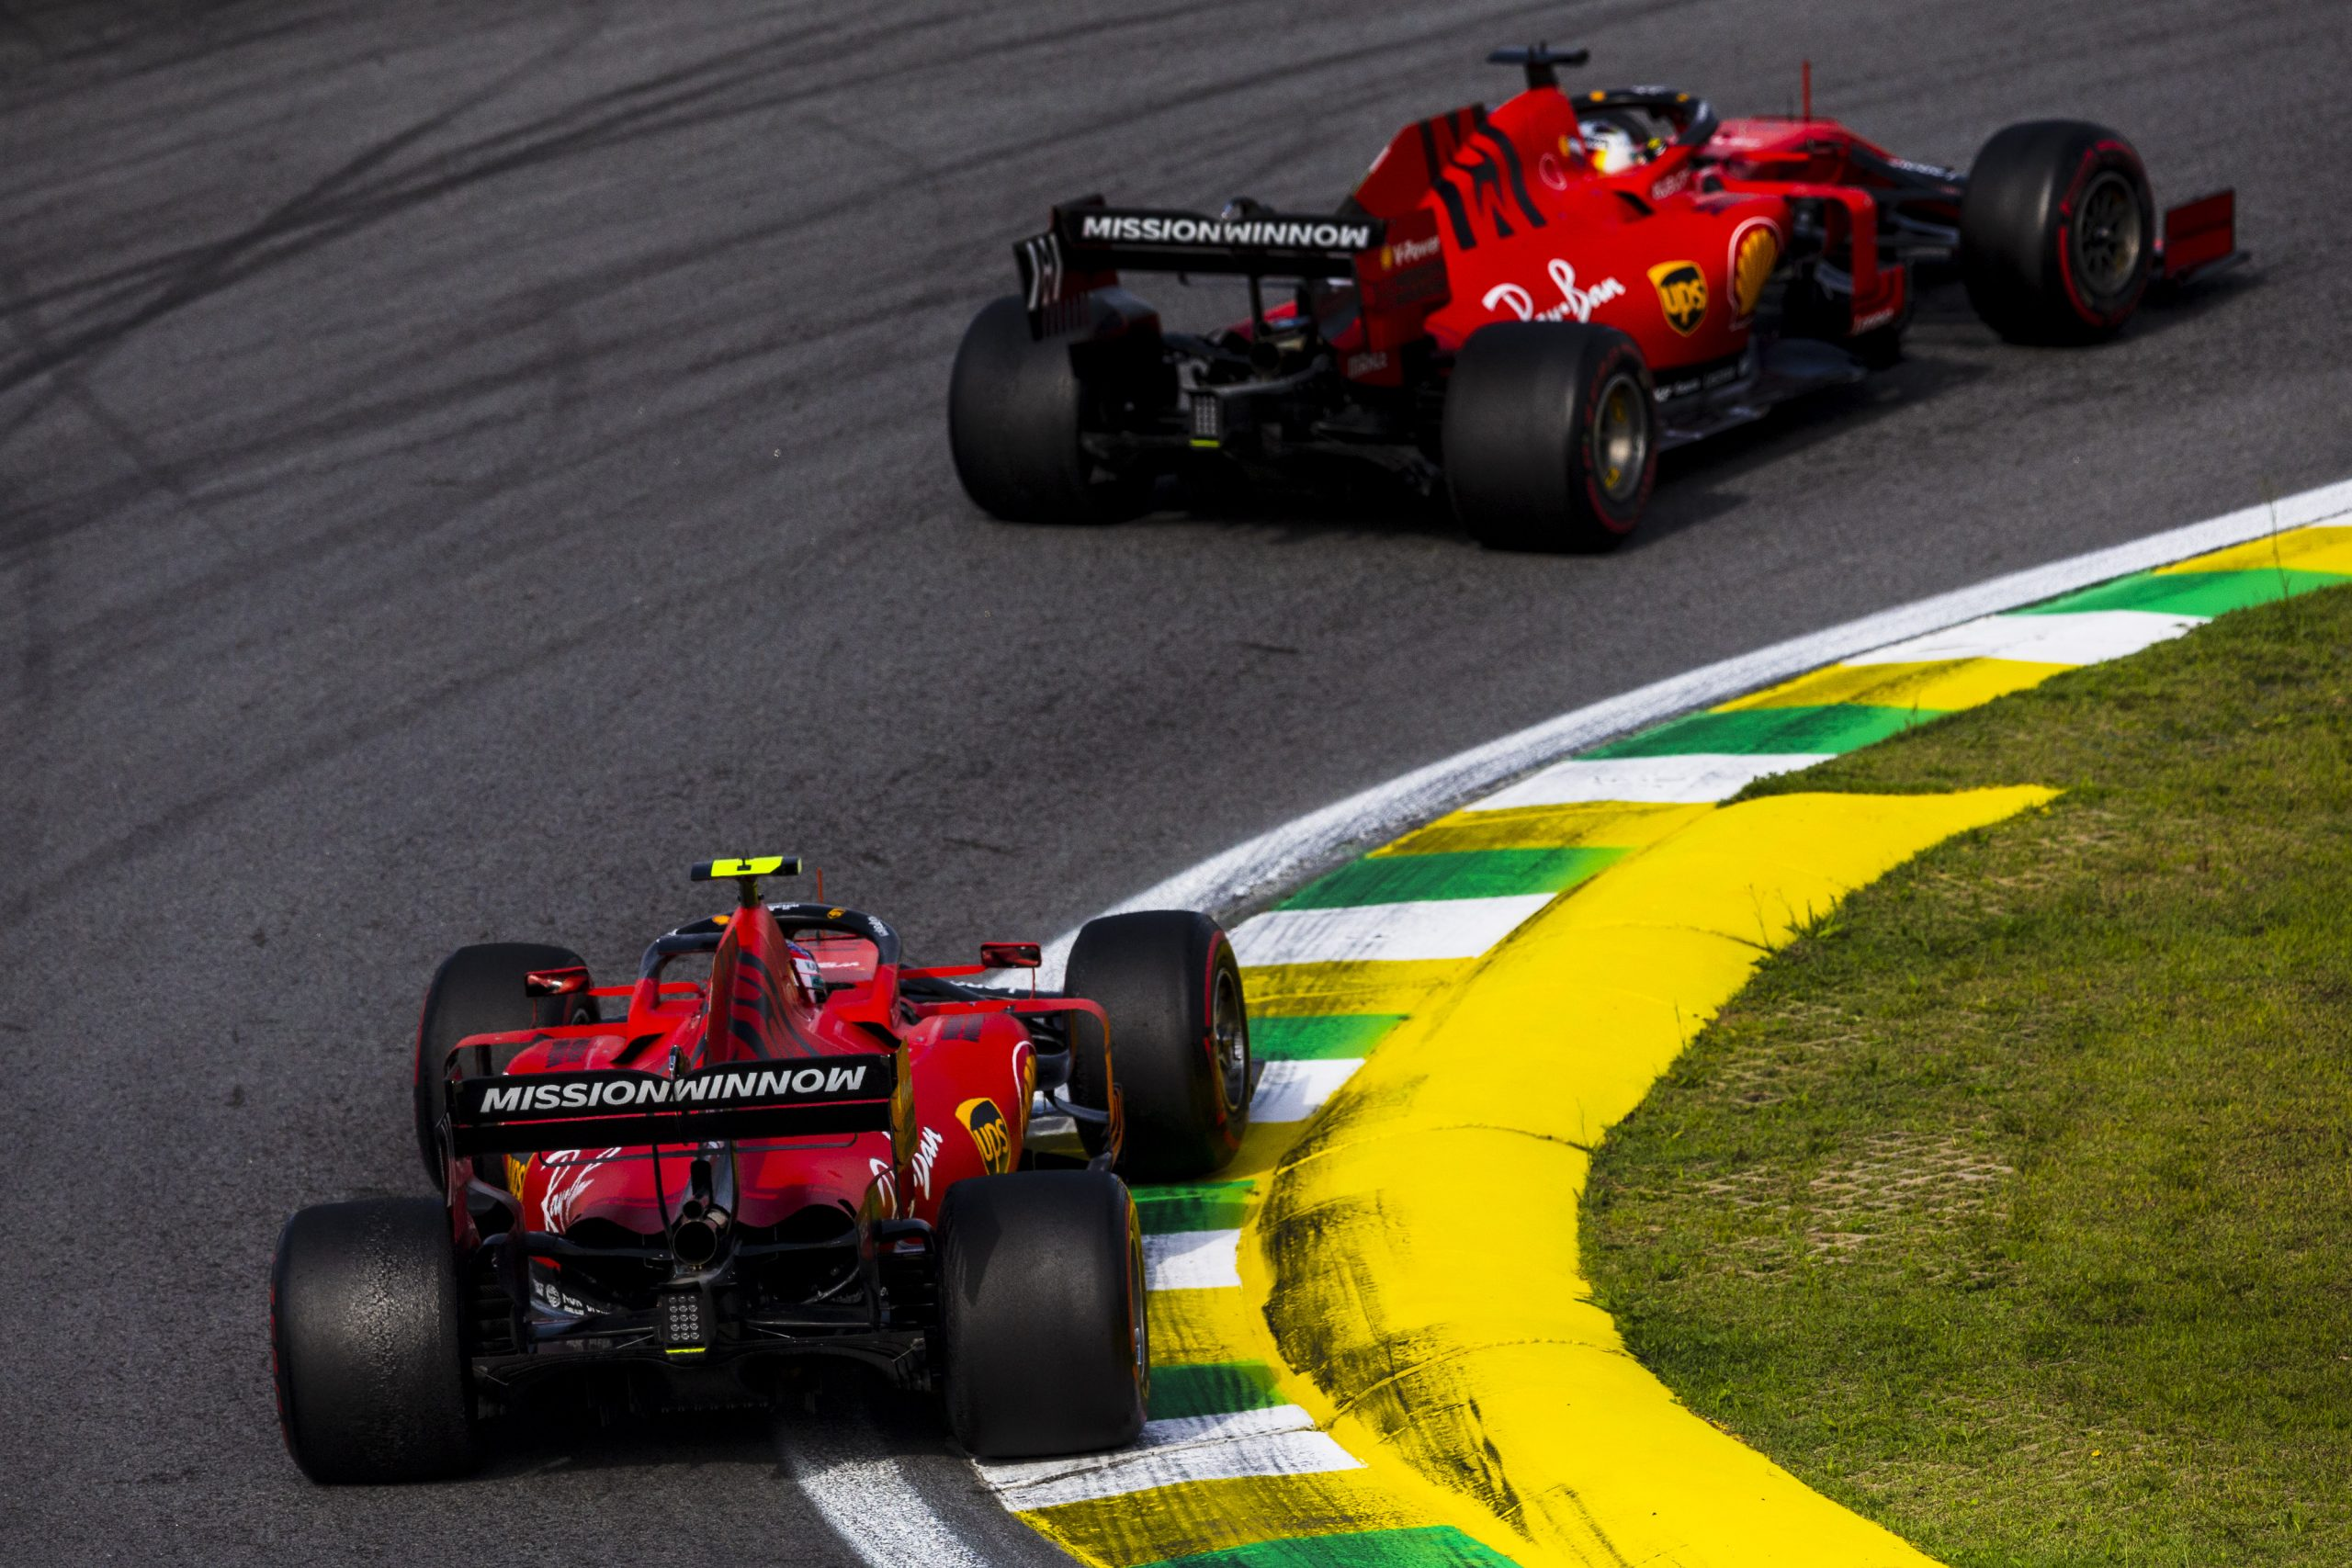 F1 Formula 1 Formula One Ferrari fuel system FIA STRAIGHT LINE SPEED